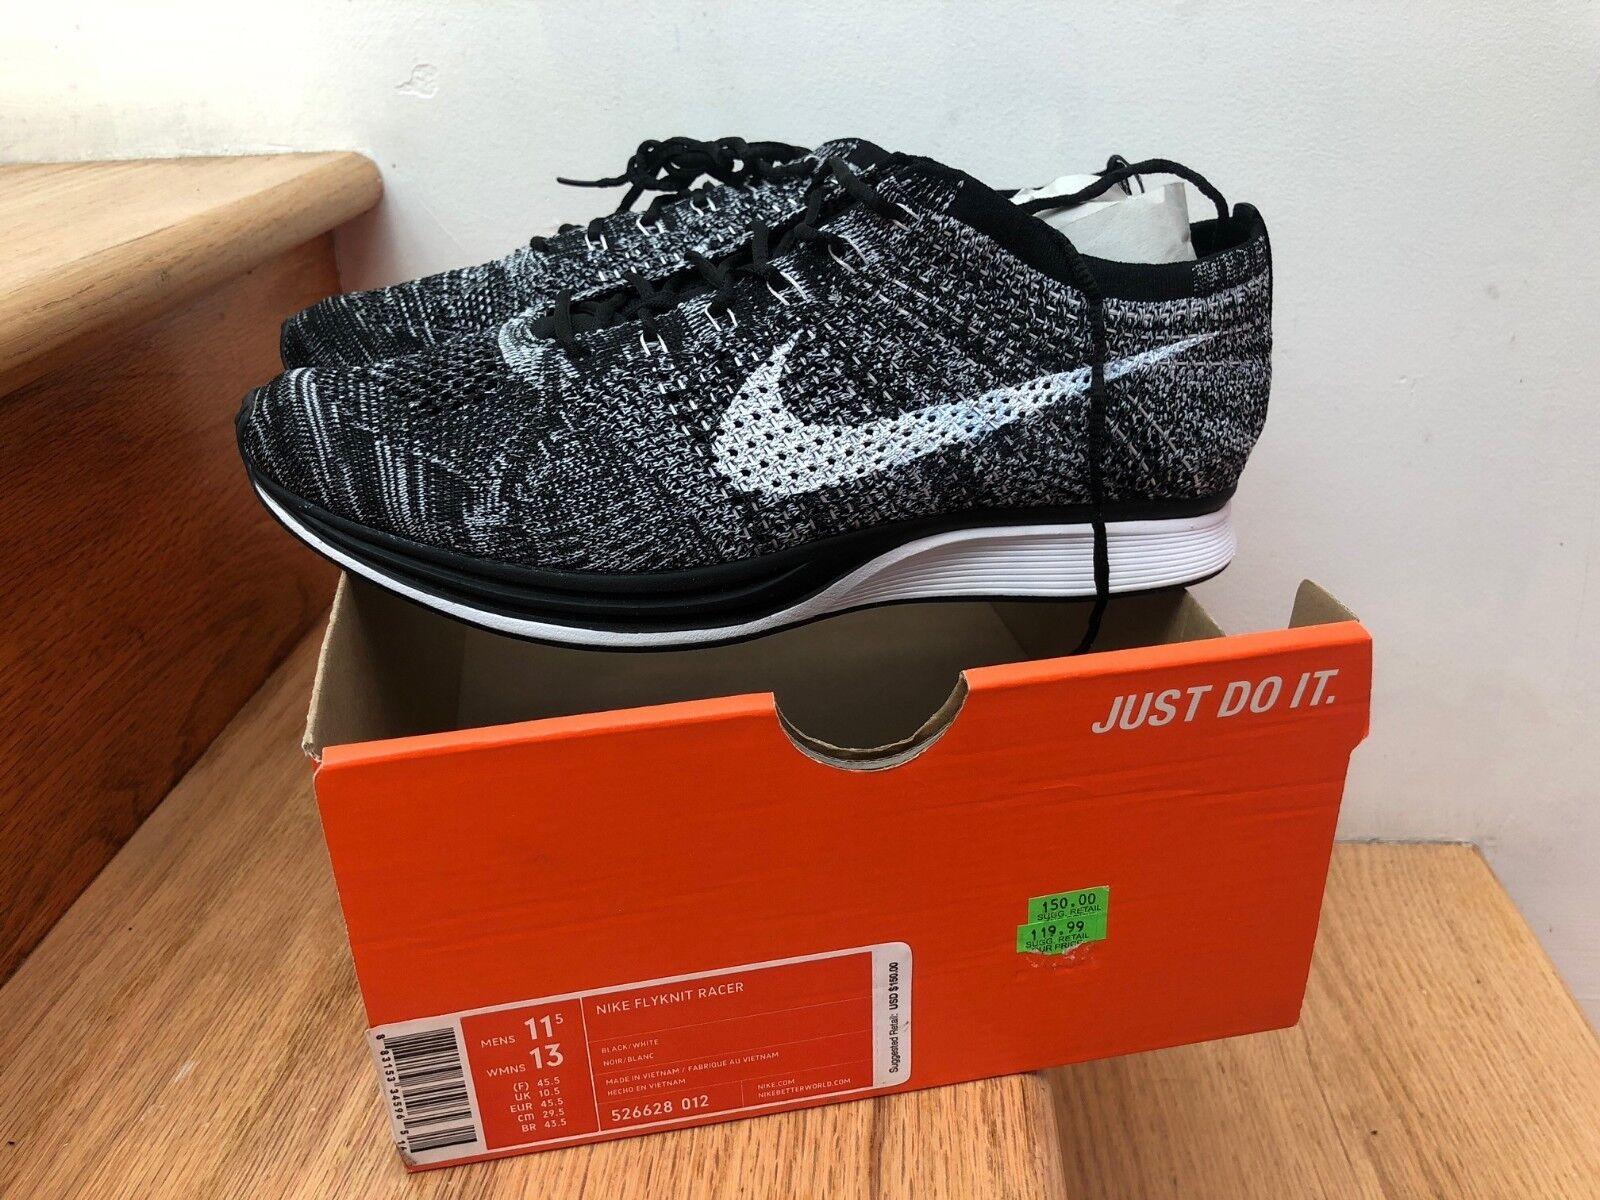 2014 Nike Flyknit Racer Oreo 2.0 Grey Black White size 11.5